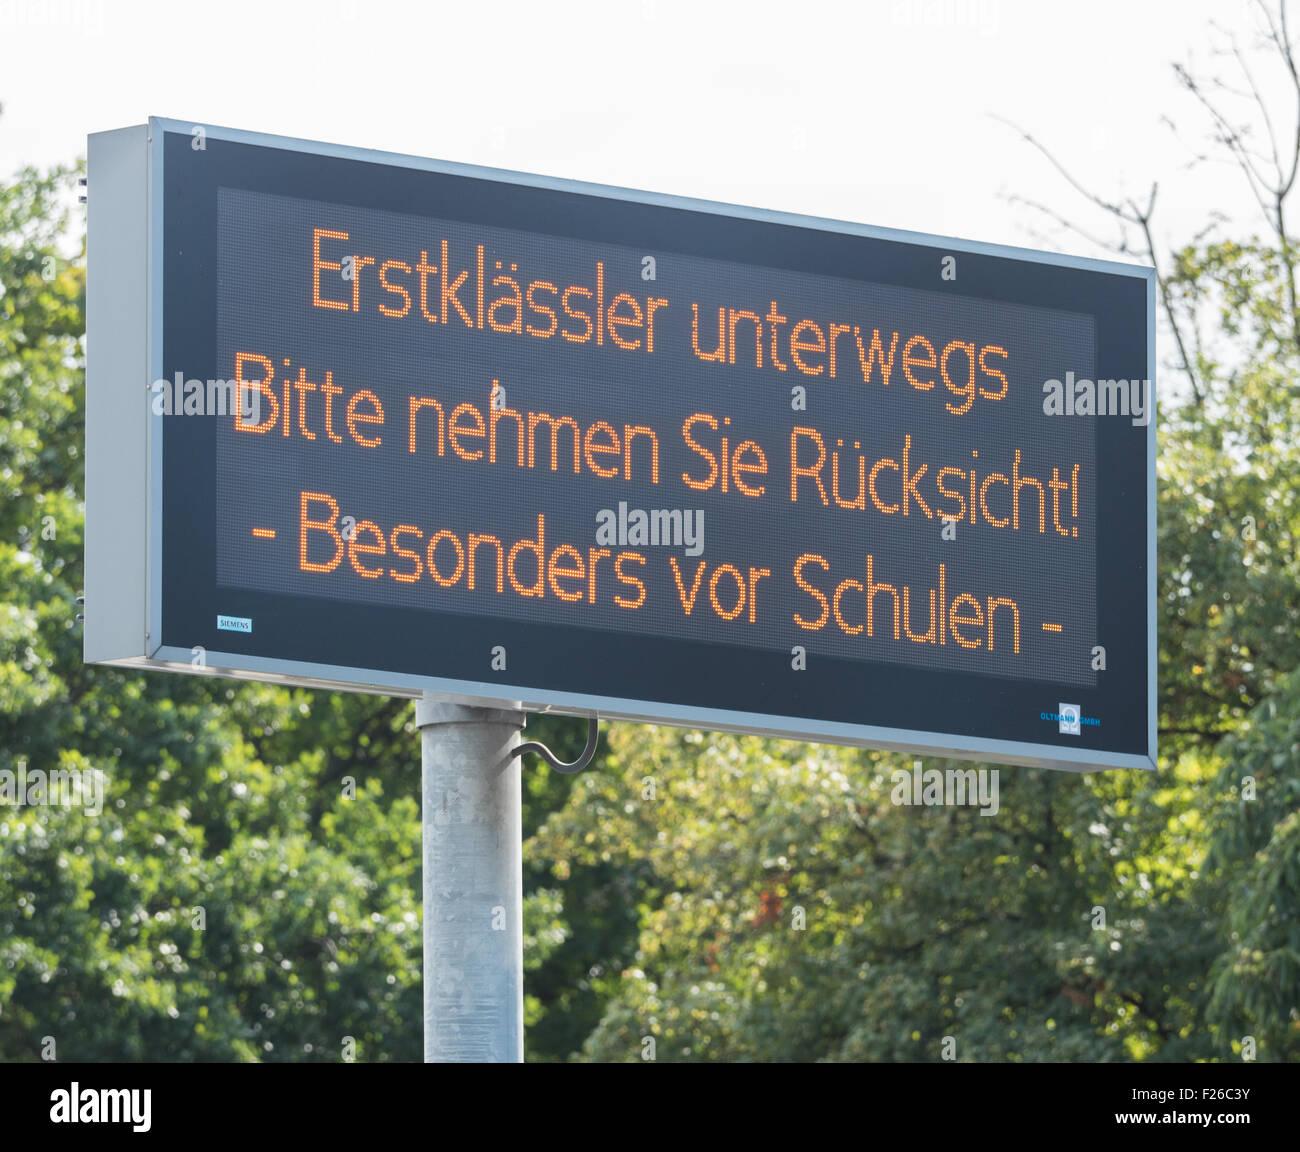 Verkehrshinweis Erstklässler - Stock Image